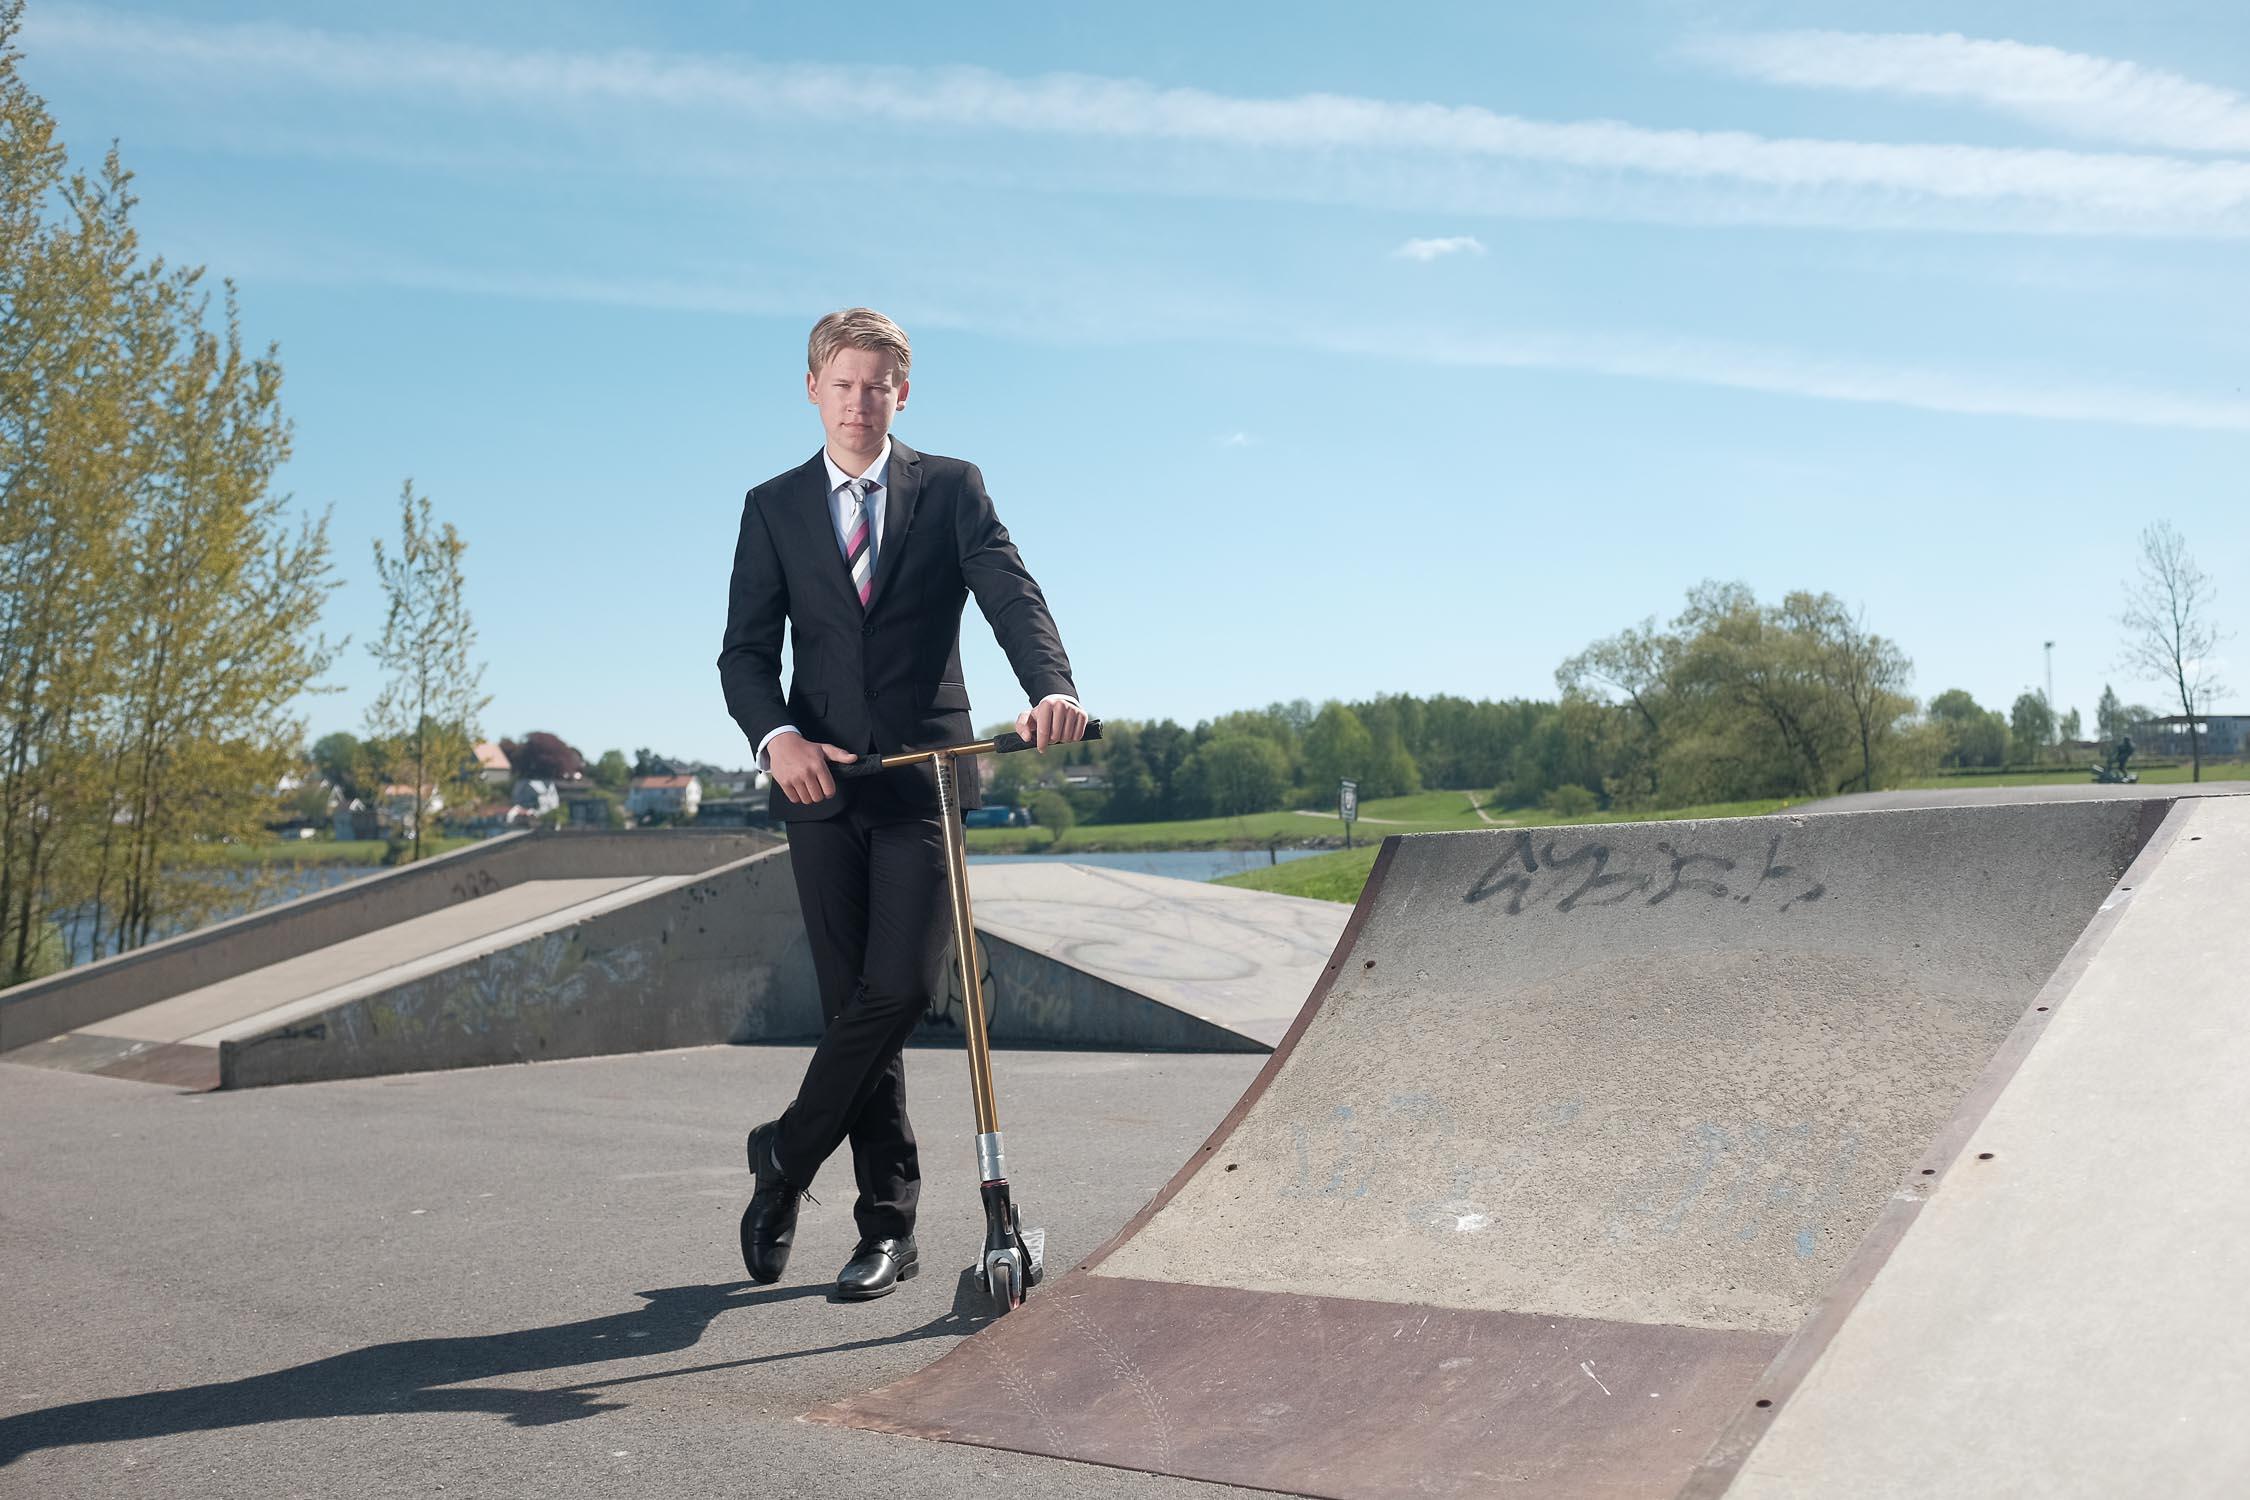 konfirmant-konfirmantfotografering-fotograf-sarpsborg---3.jpg